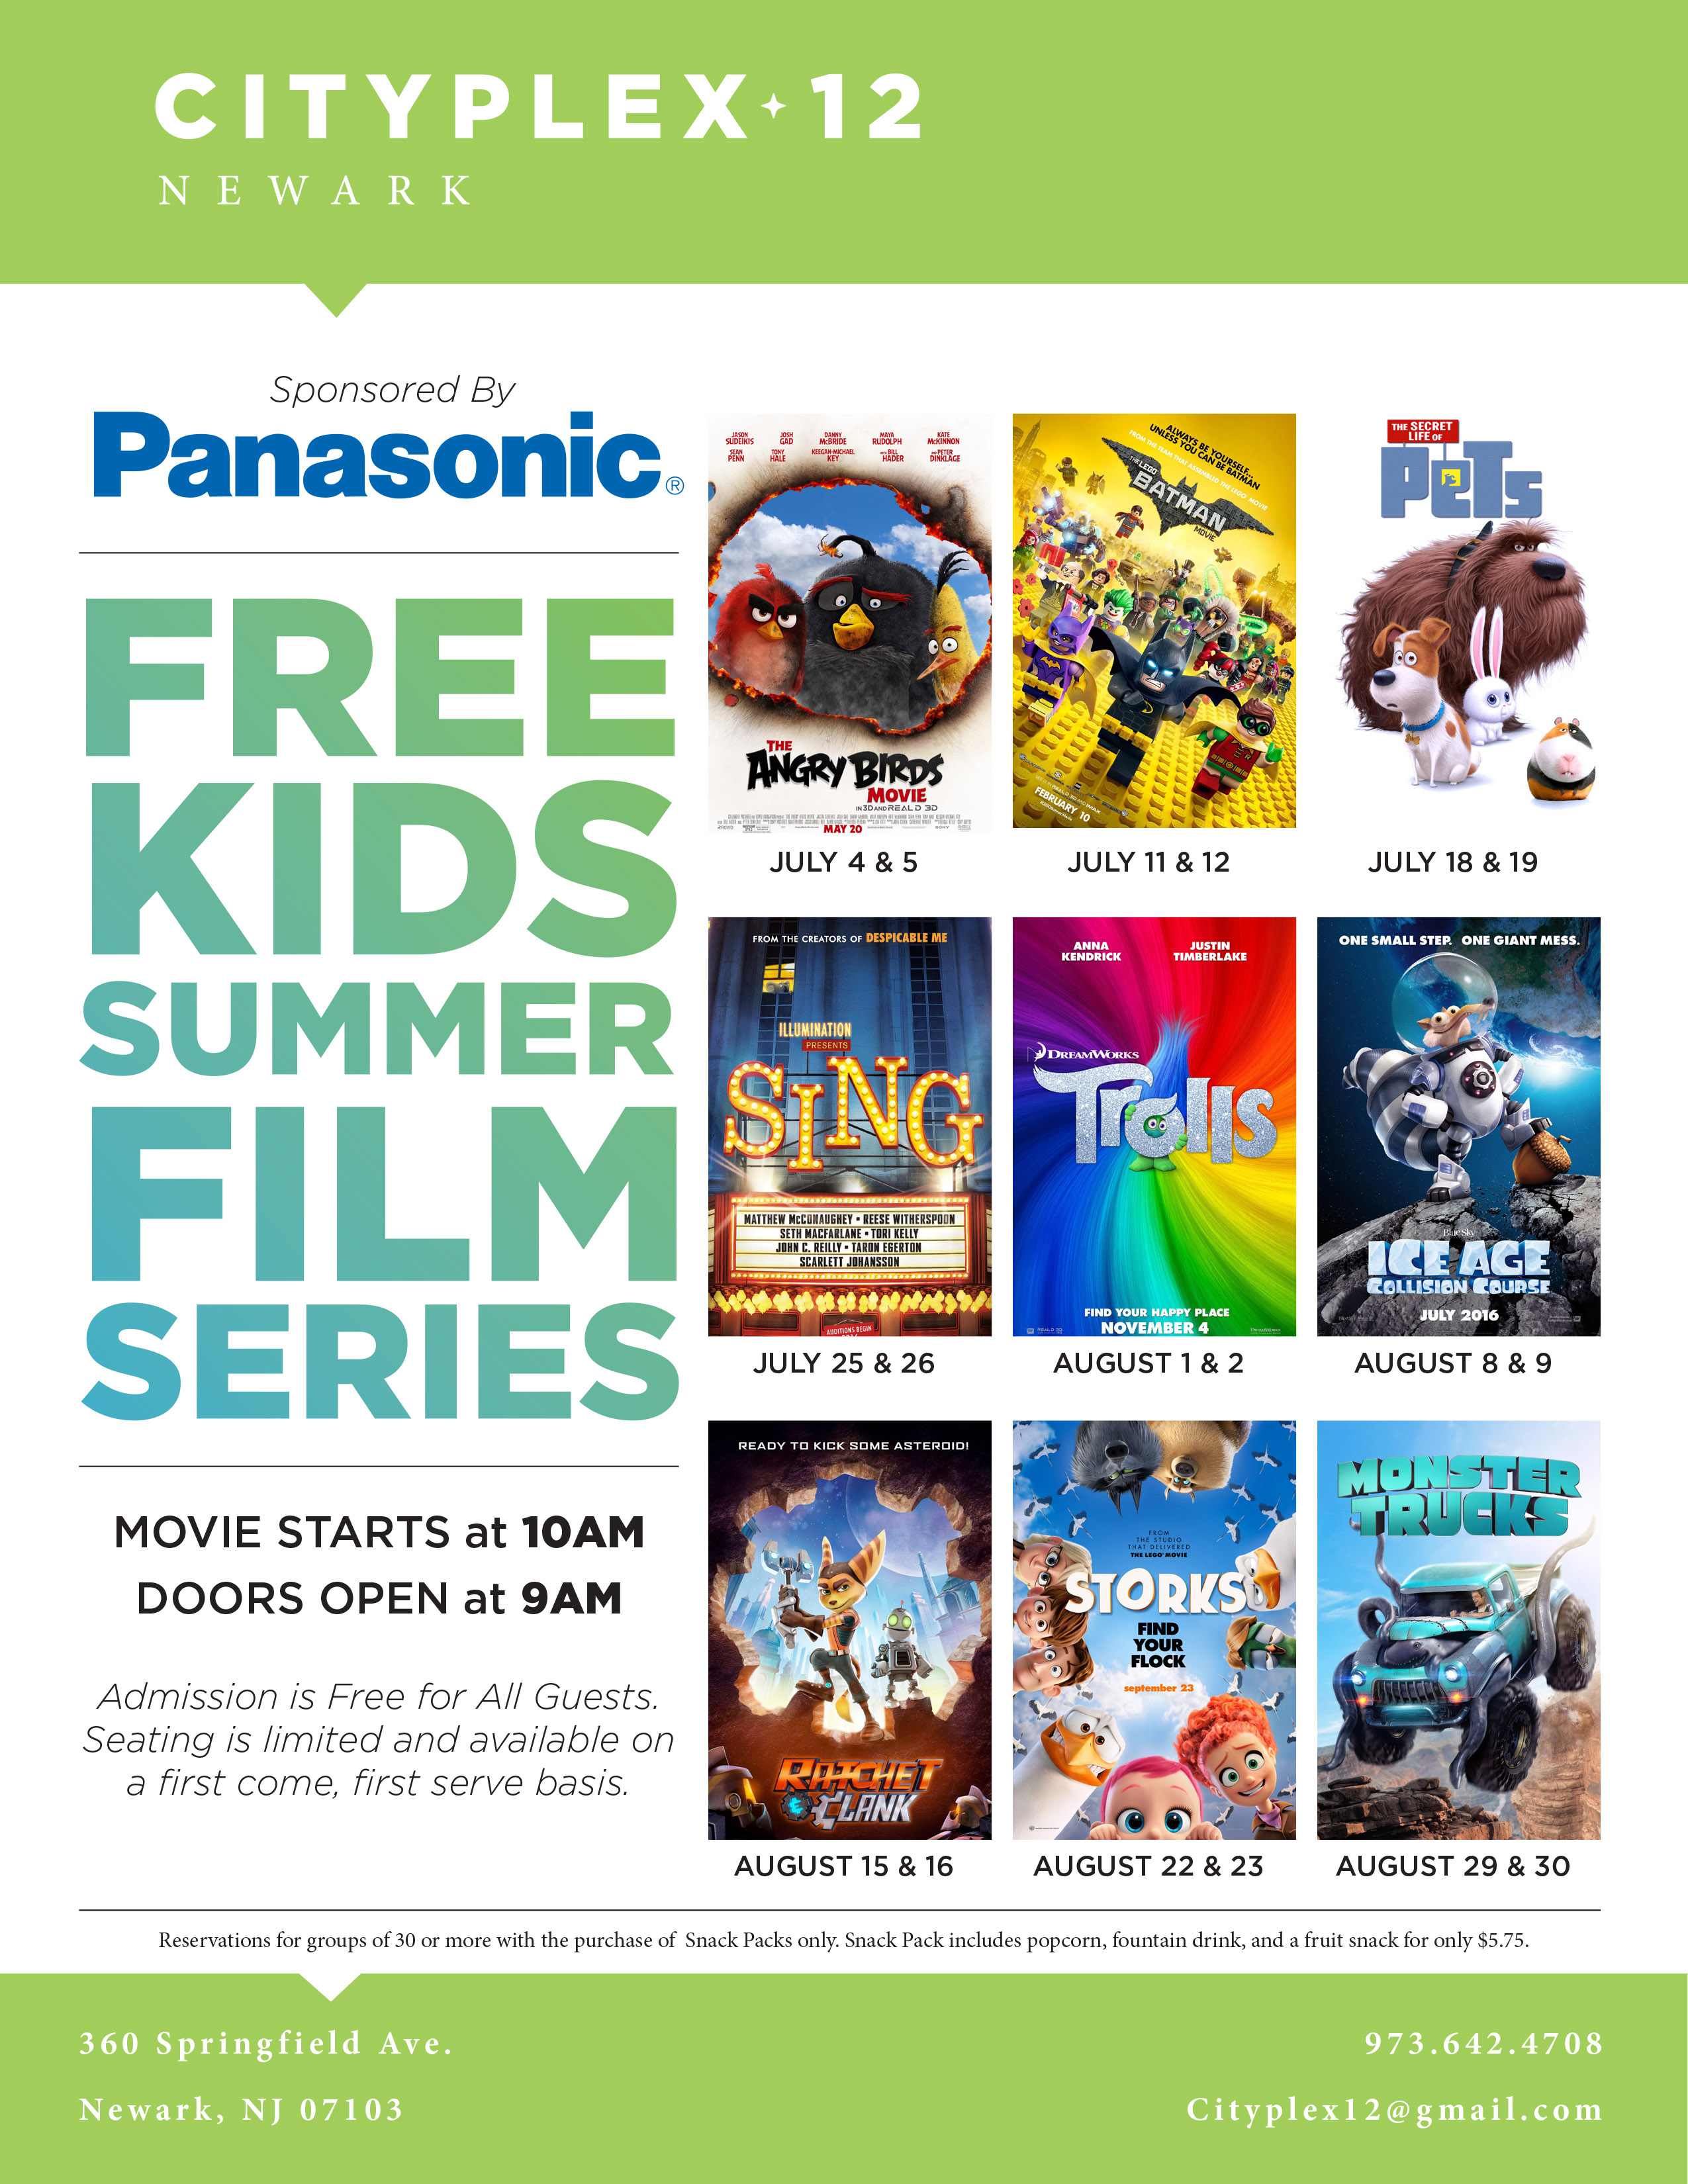 free kids summer films - Free Images Of Kids